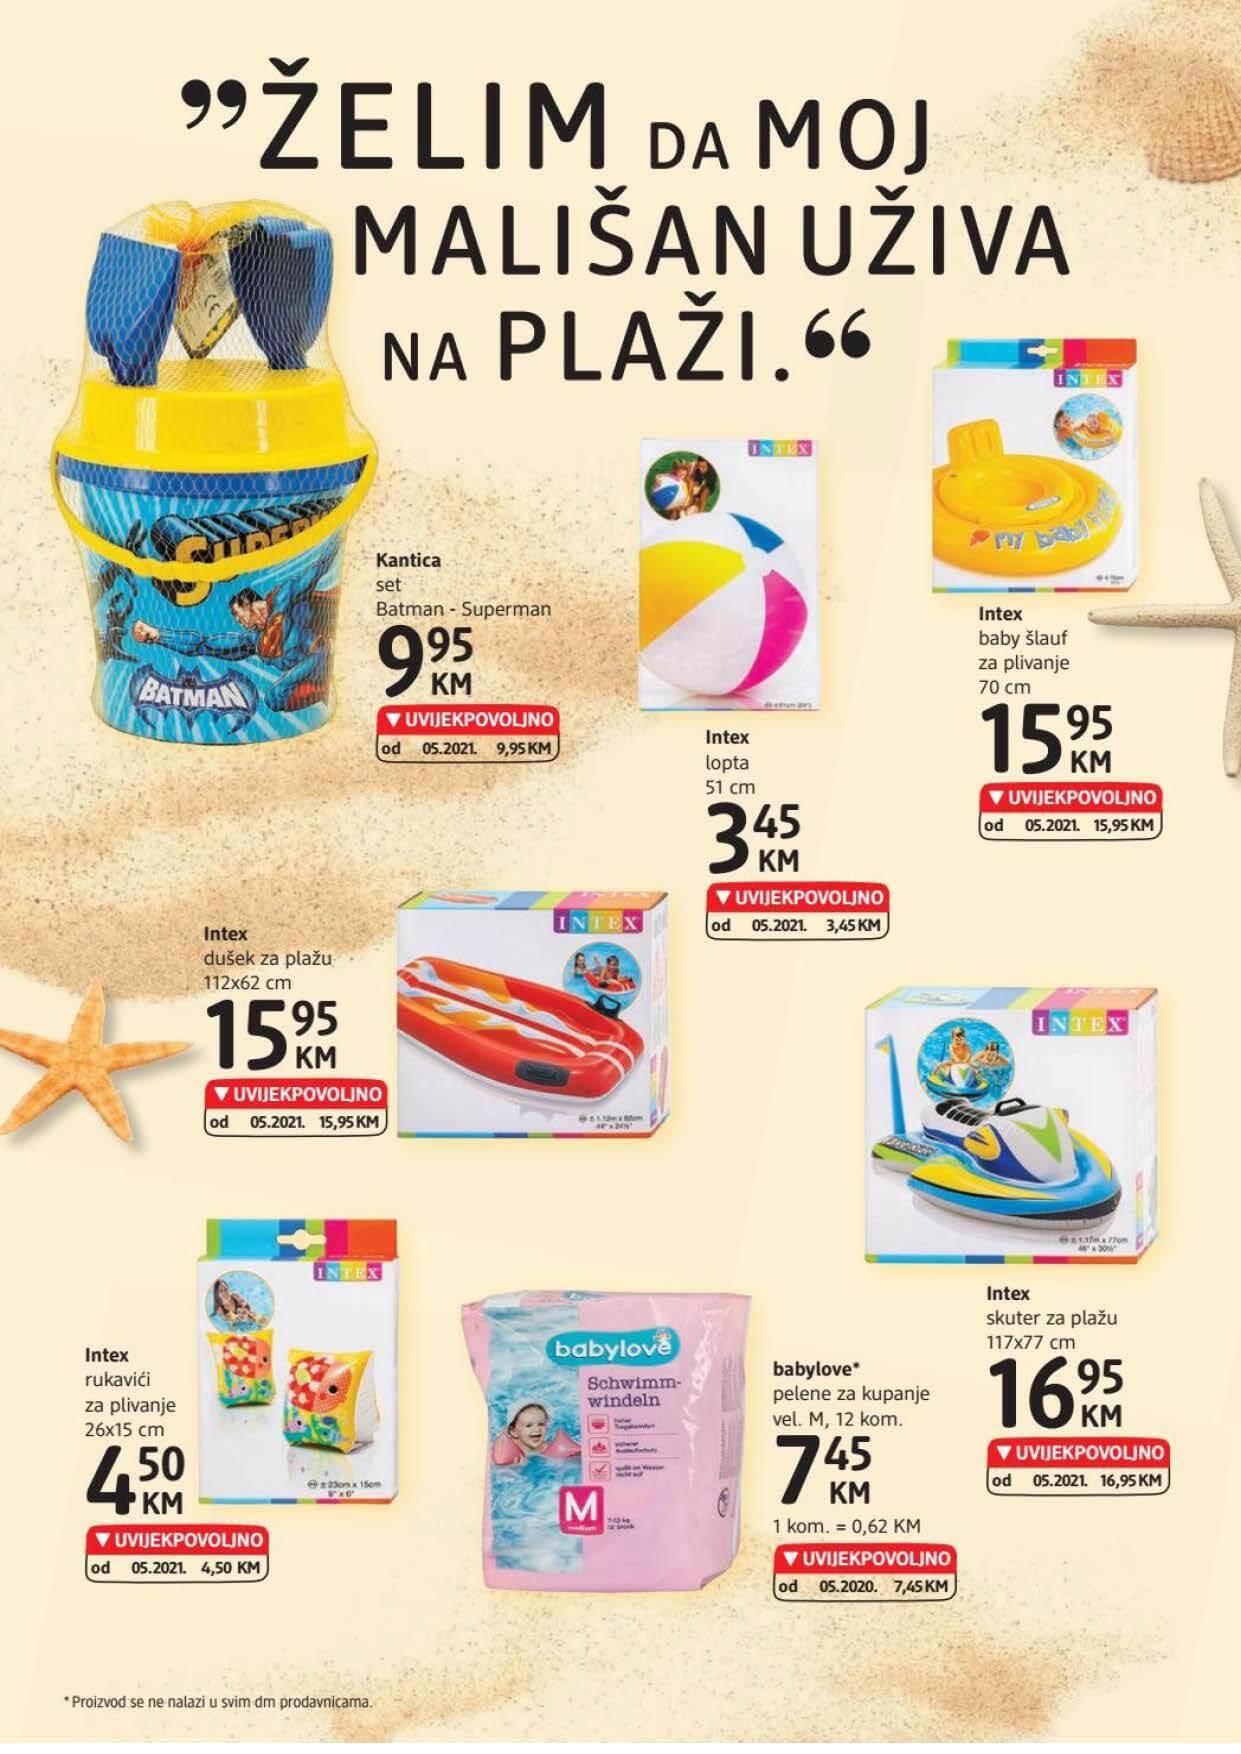 DM Katalog BiH JUN JUL 2021 23.6.2021. 6.7.2021. eKatalozi.com PR Page 06